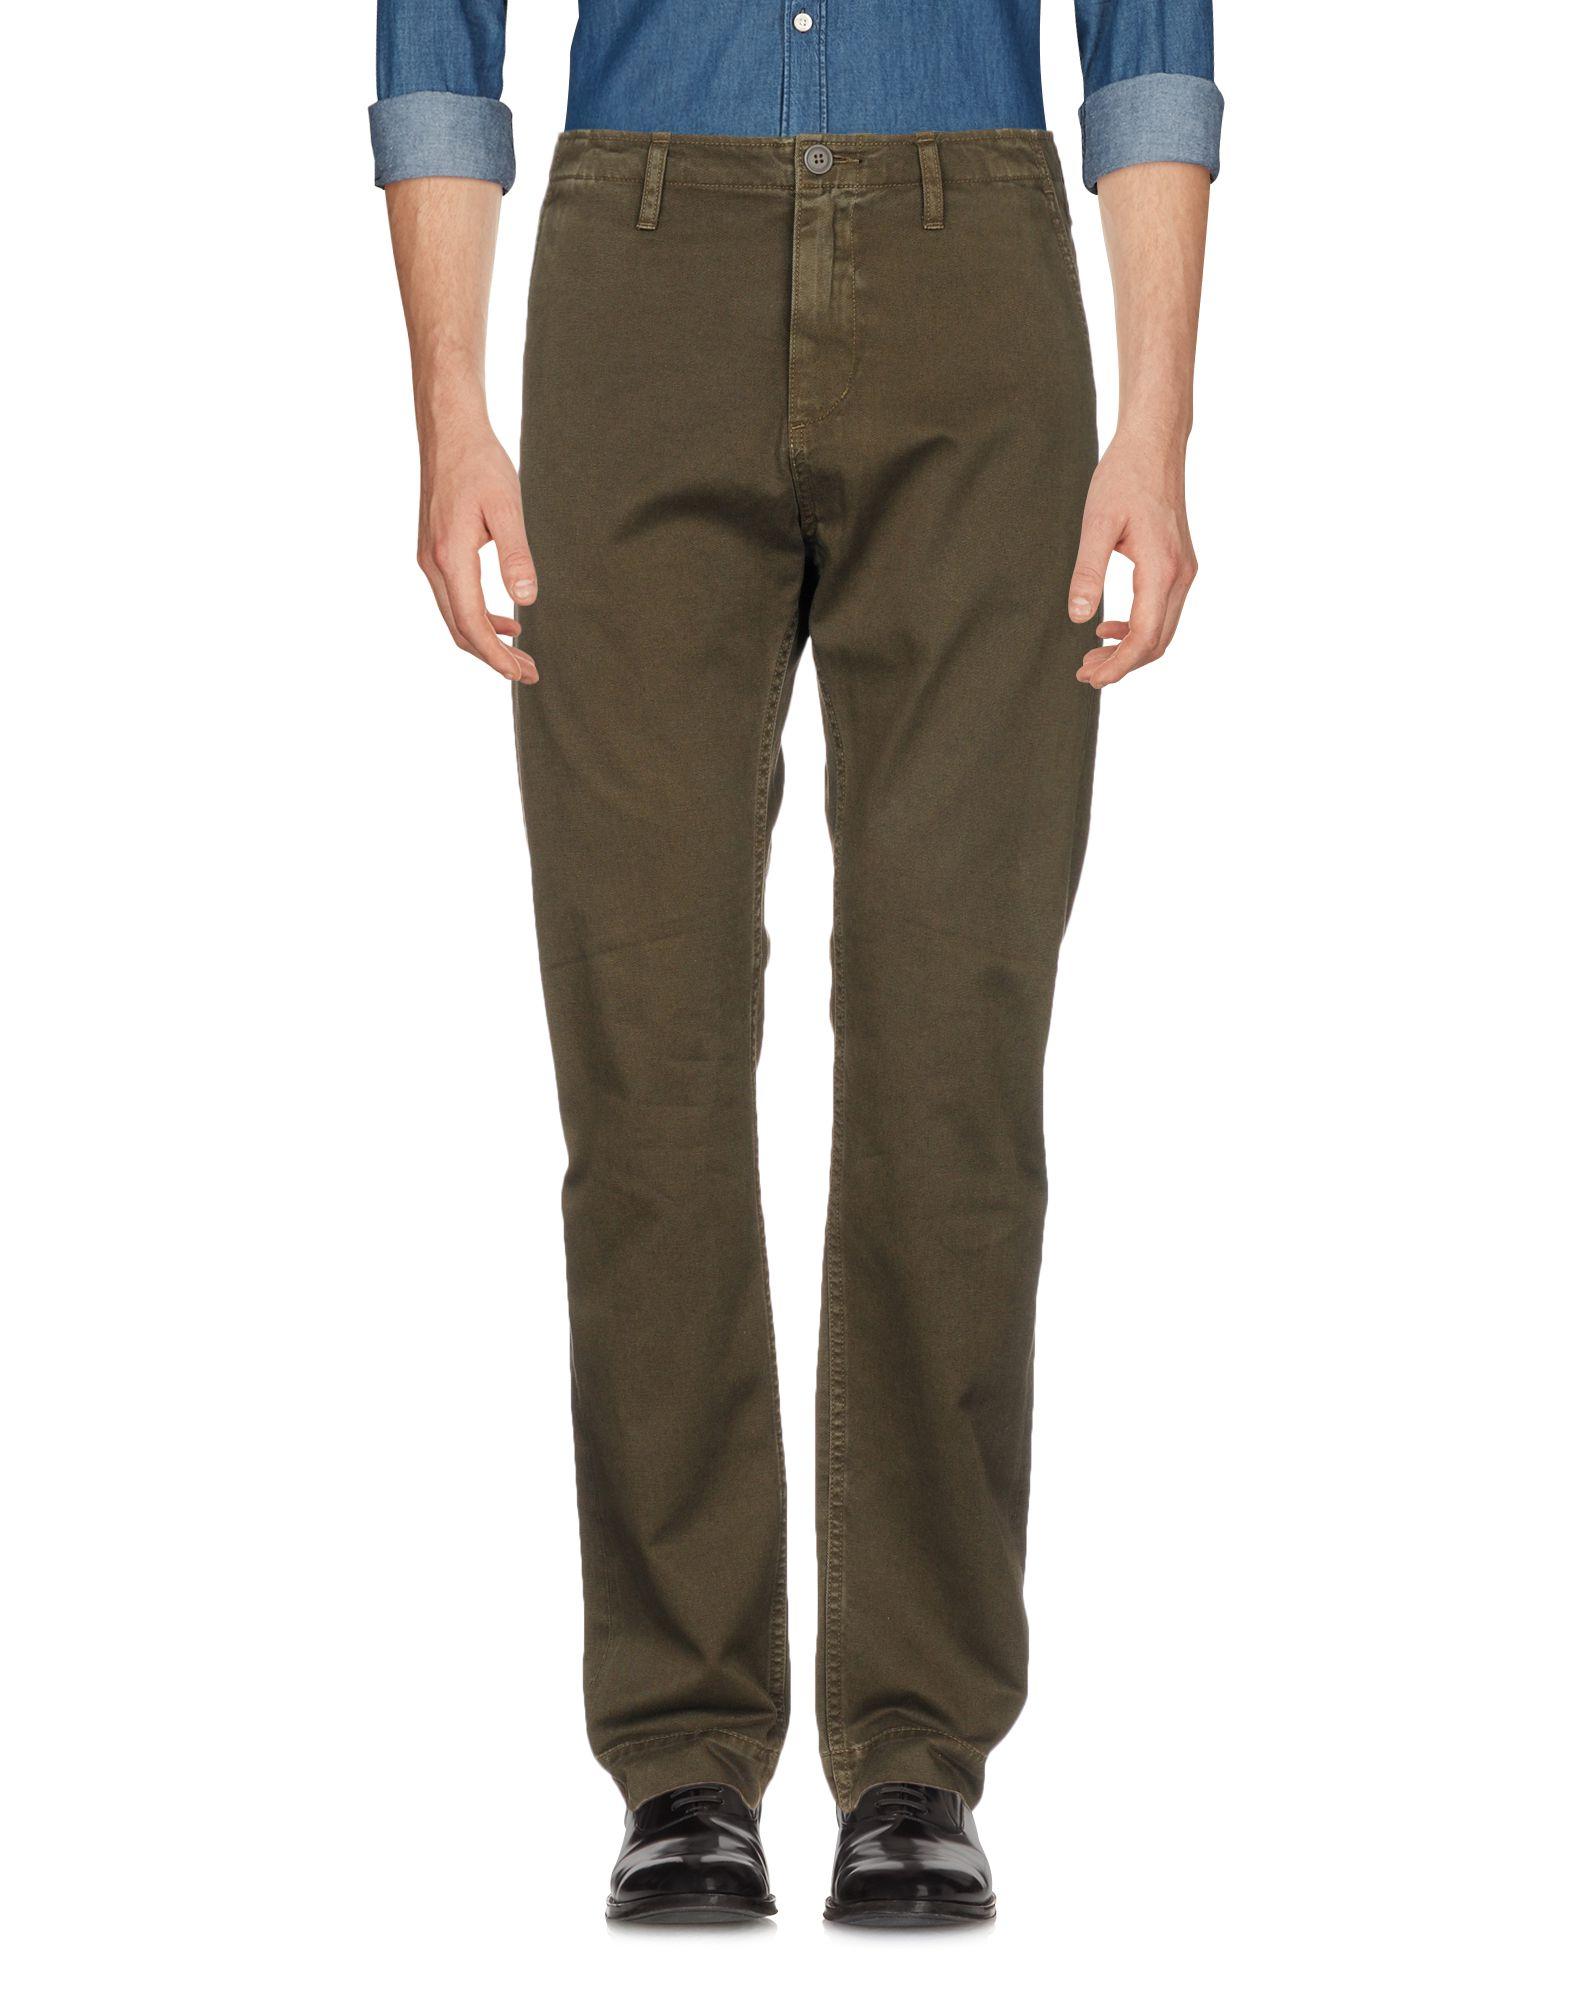 JEAN SHOP Casual Pants in Dark Green